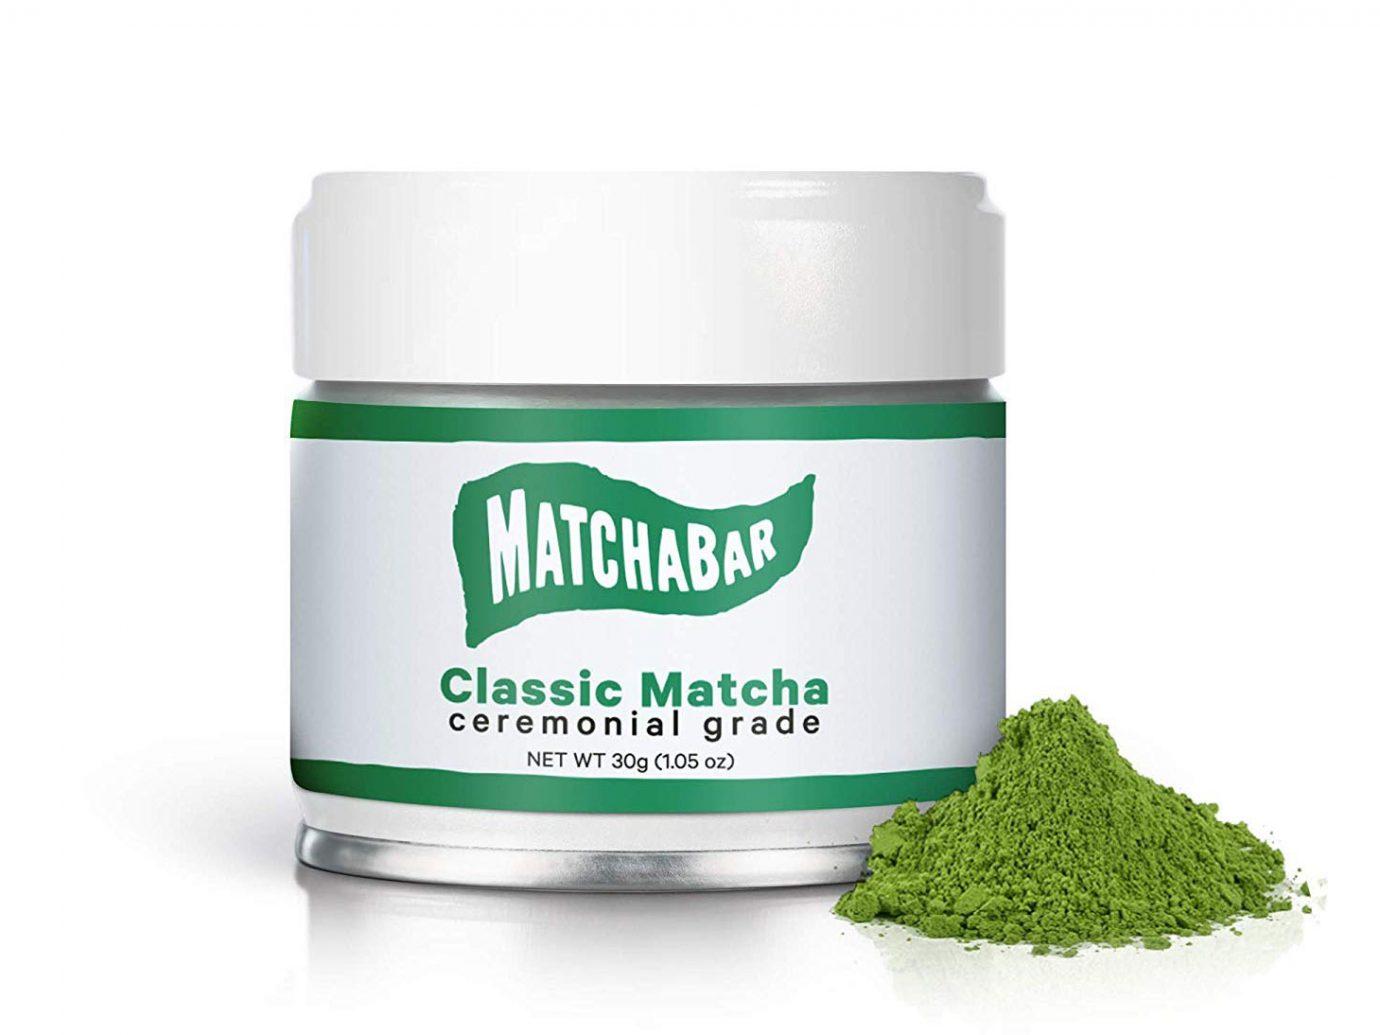 MatchaBar Ceremonial Grade Matcha Green Tea Powder